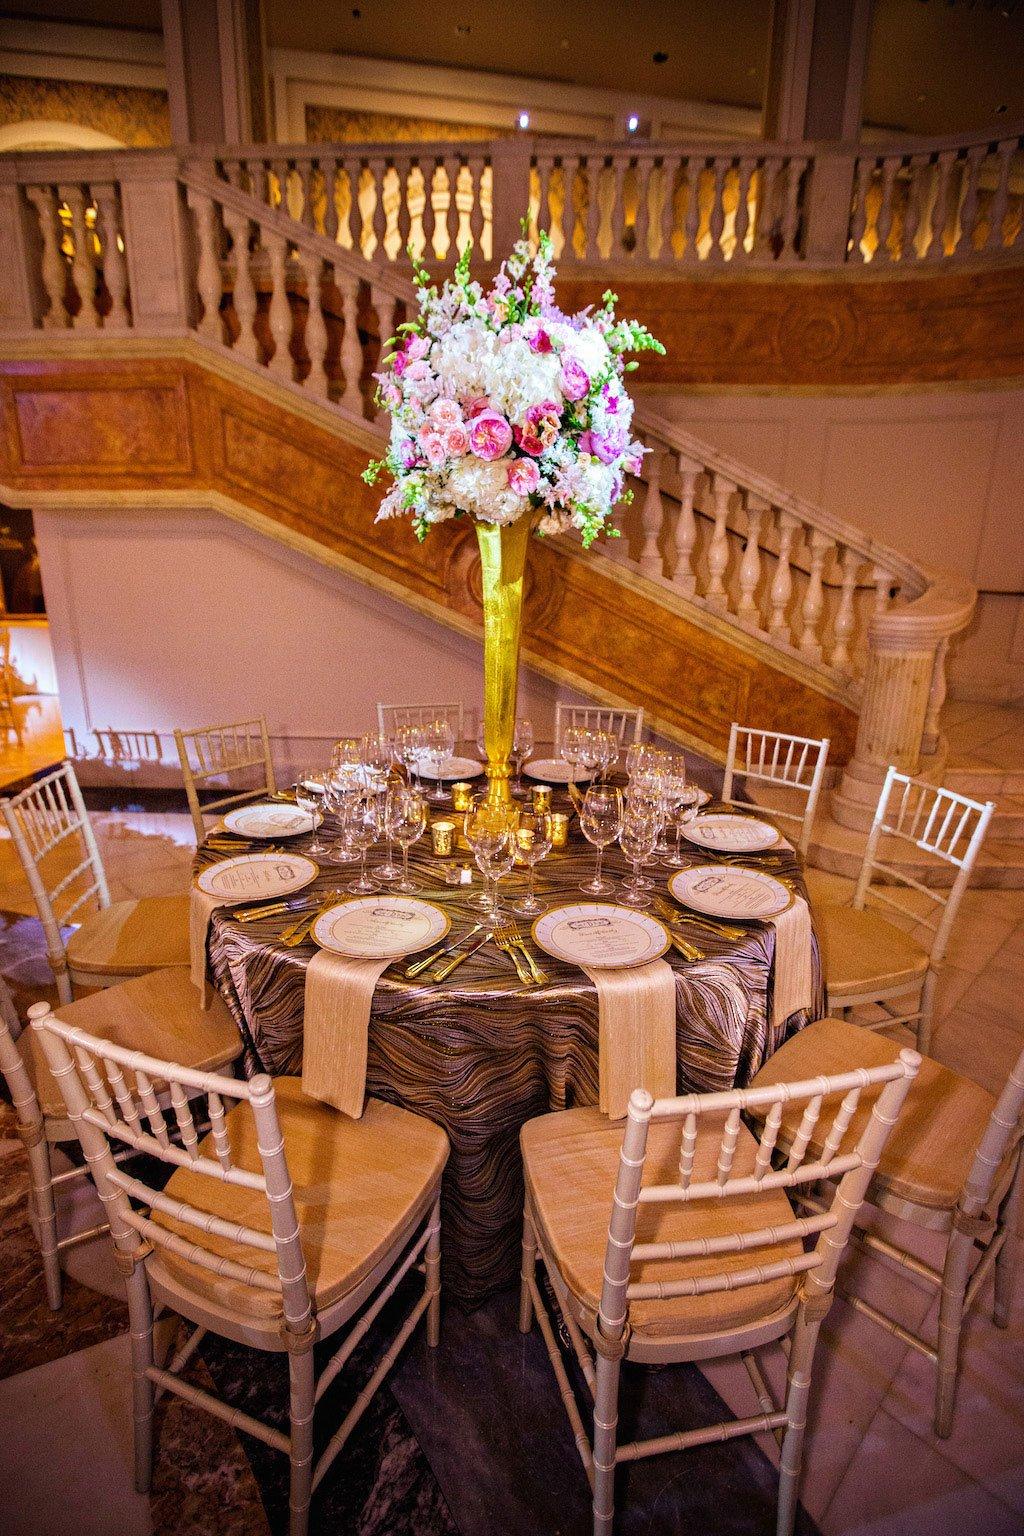 8-26-16-modern-glam-national-museum-women-arts-dc-wedding-10new